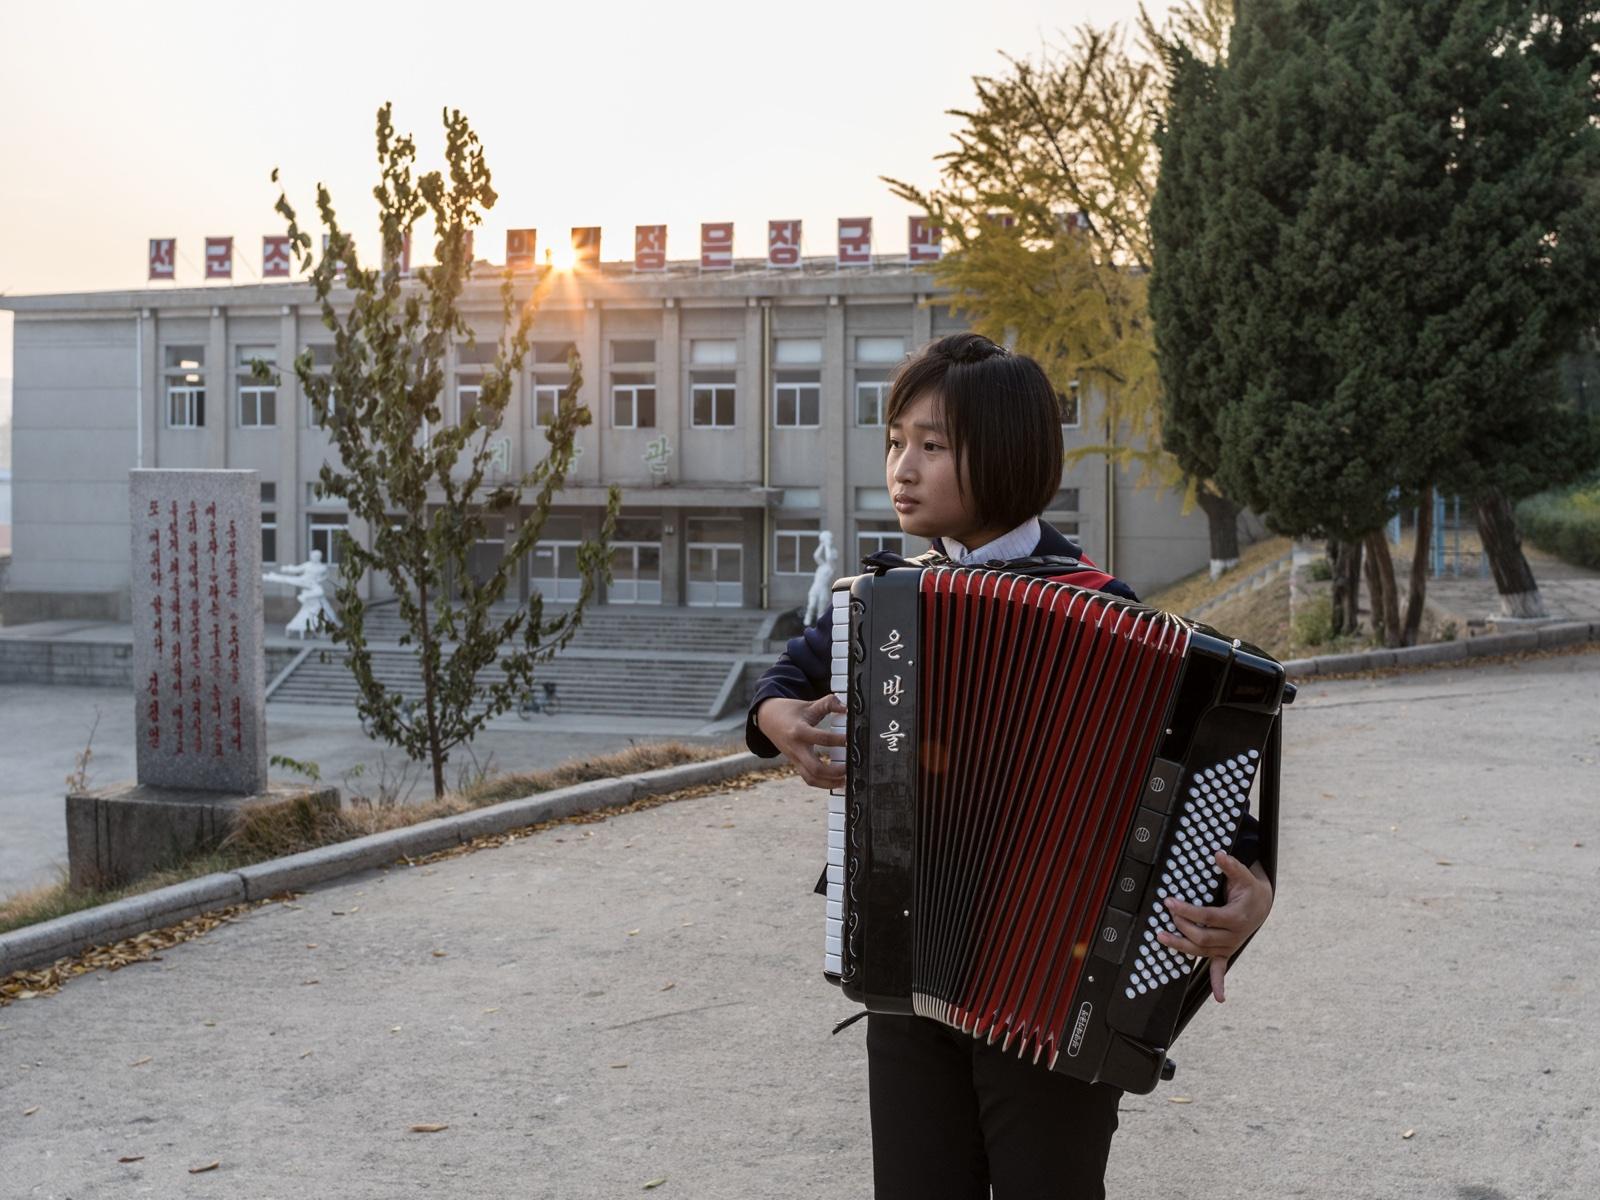 © Carl de Keyzer/Magnum Photos 2018 - Kaesong